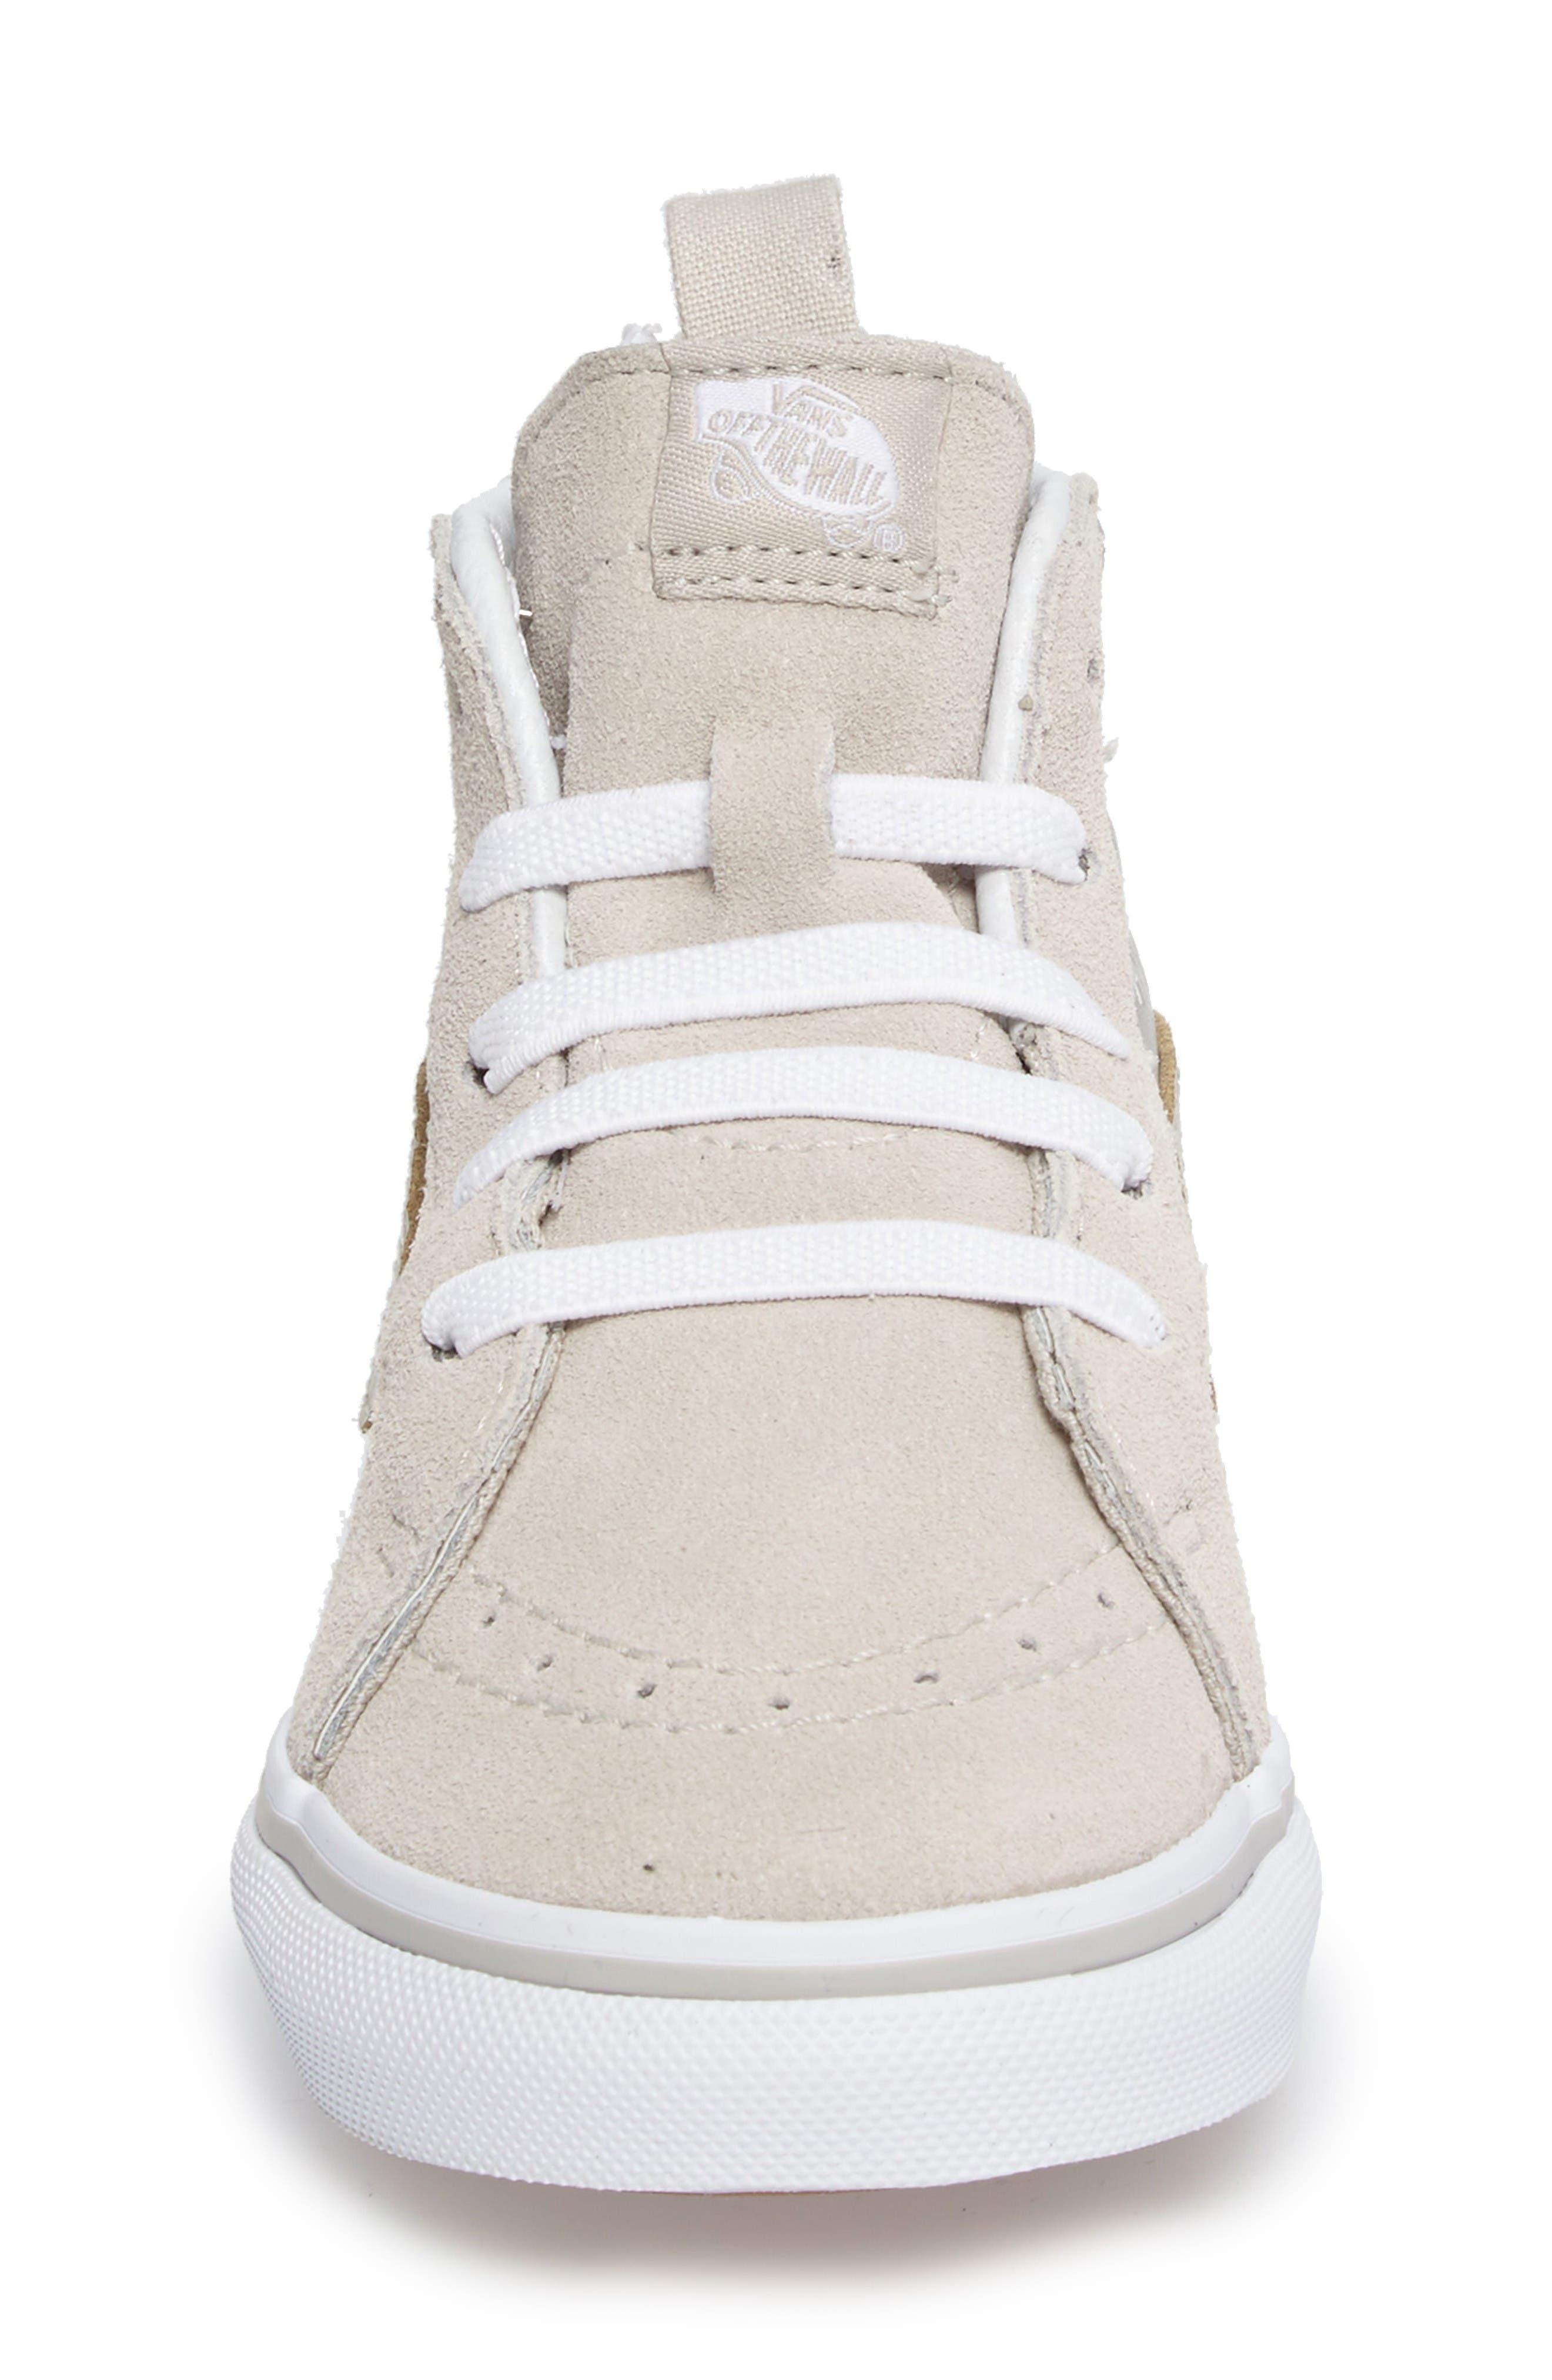 Sk8-Hi Zip Sneaker,                             Alternate thumbnail 3, color,                             Silver Metallic Heart Suede